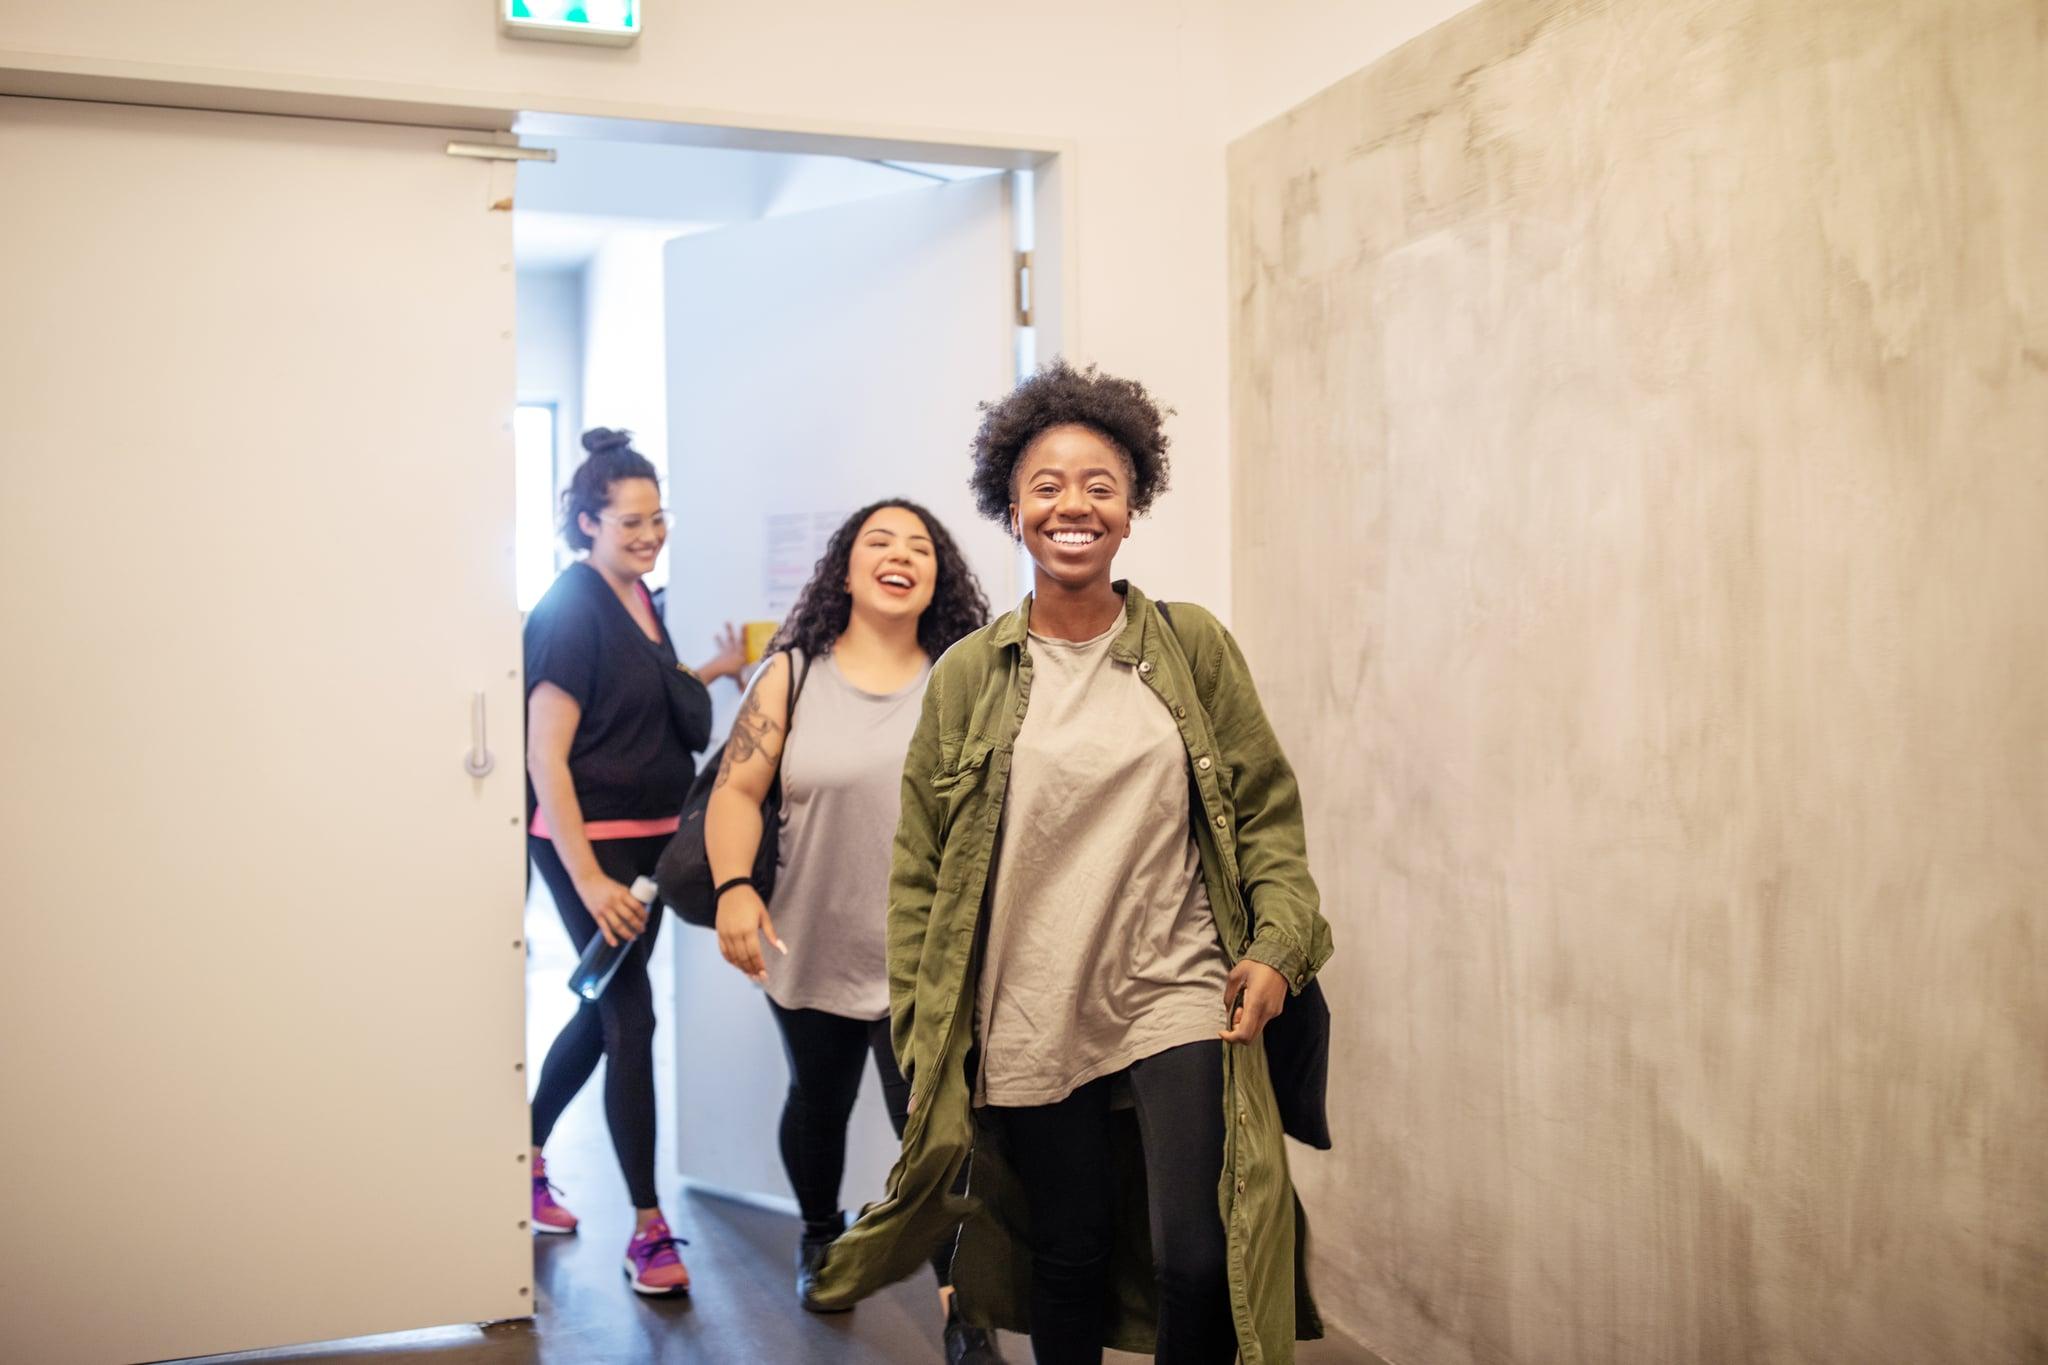 Group of multiracial females entering fitness studio. Smiling women walking through a doorway in dance class.